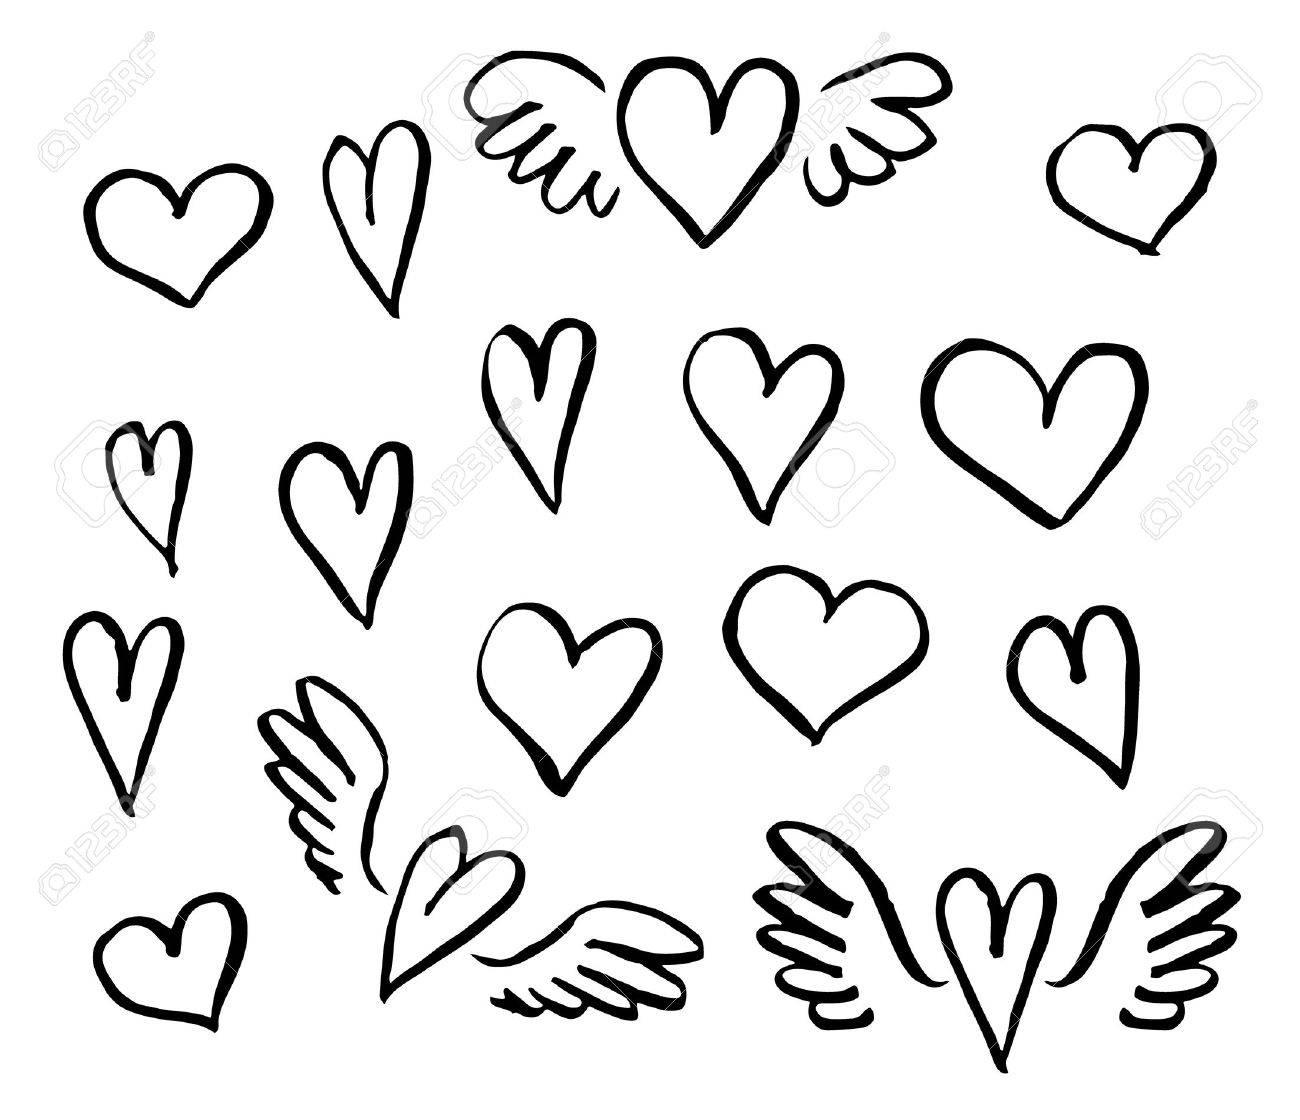 Vector illustration hand drawn hearts set of design elements - 51199390